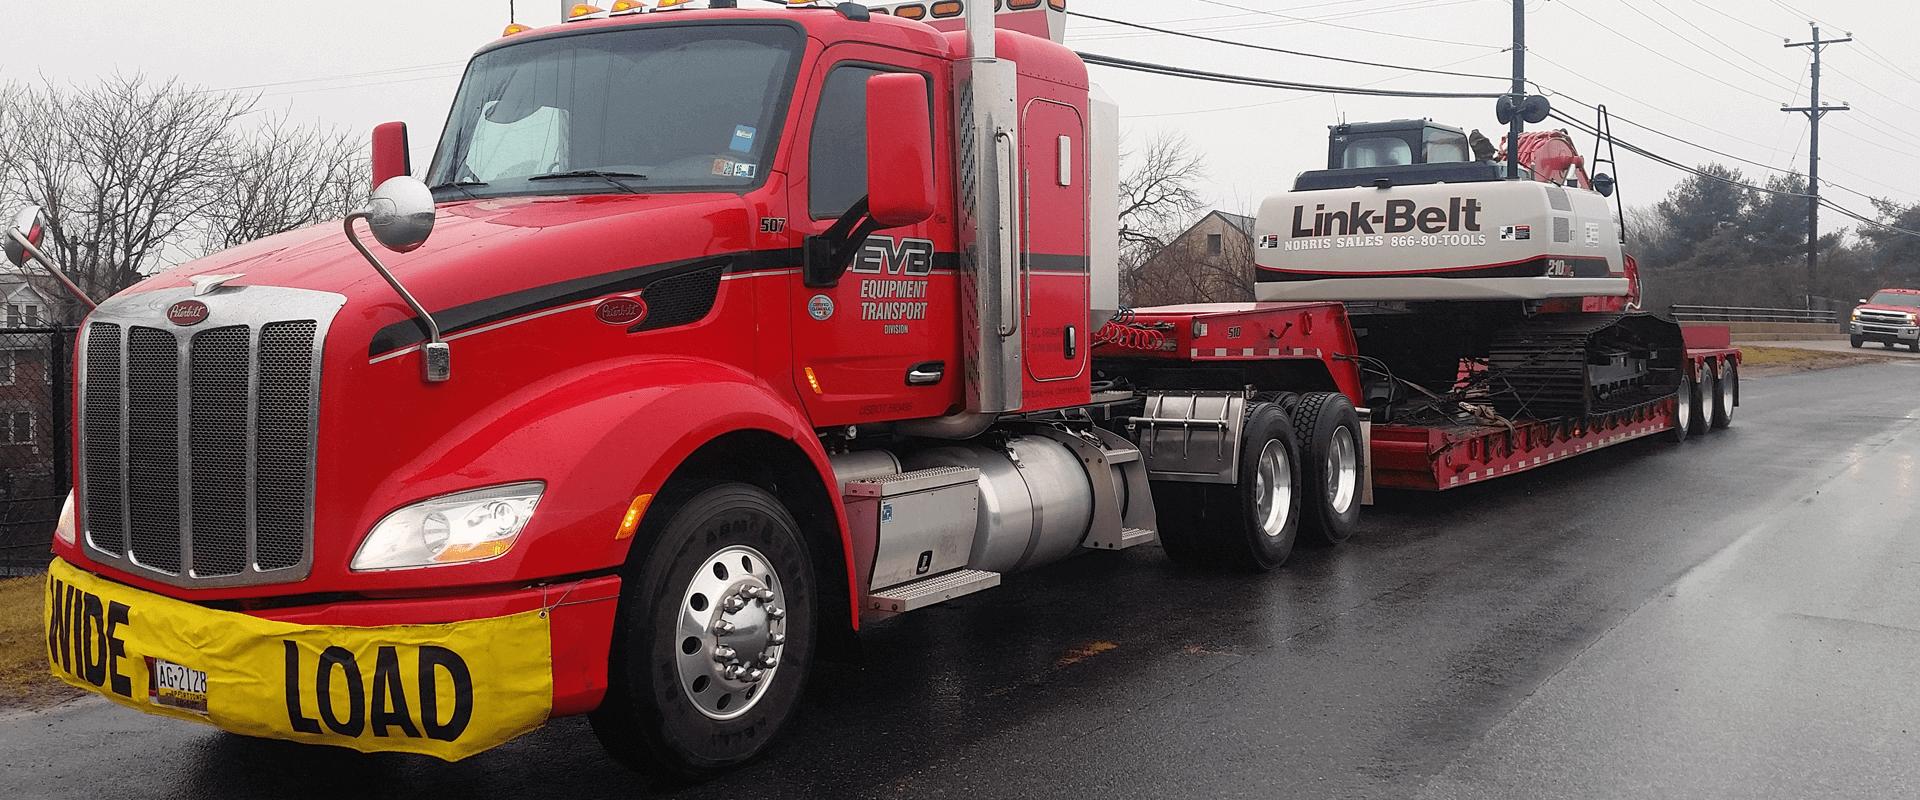 Philadelphia Towing, Truck Road Service, Equipment Transport